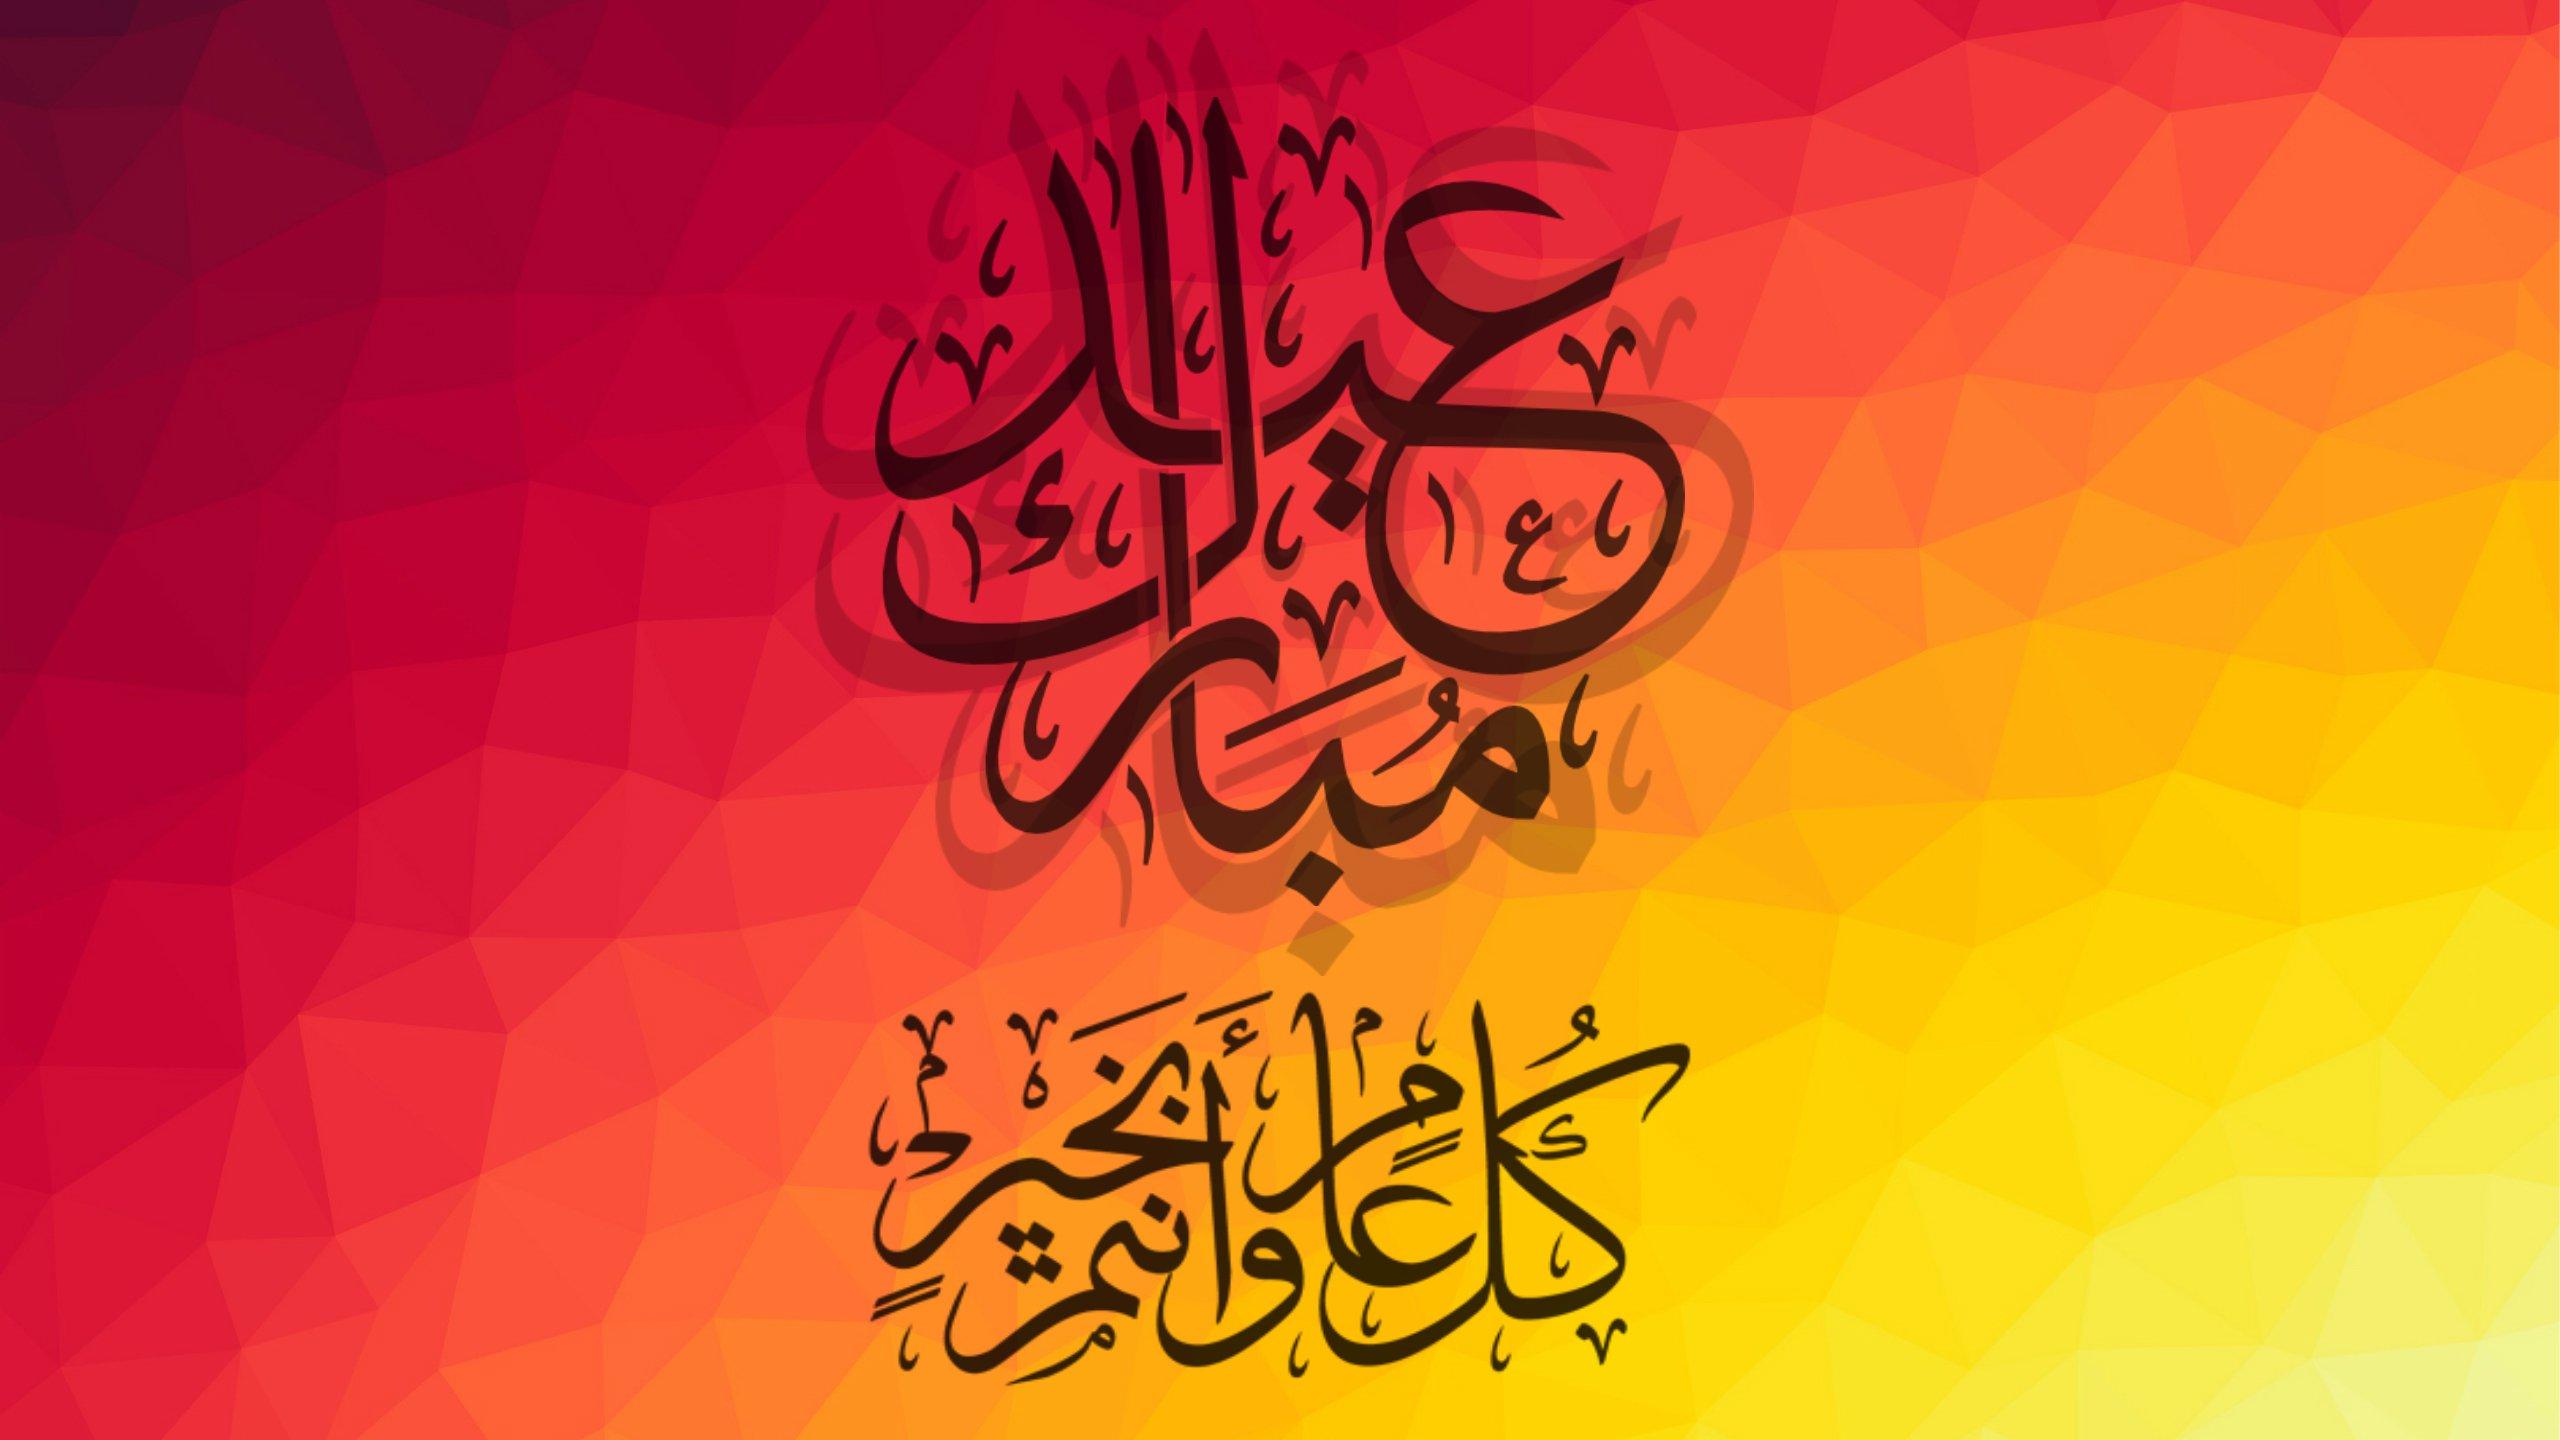 Wallpaper 2560x1440 Px Arabian Doha Islam Museum Of Islamic Art 2560x1440 Coolwallpapers 1338595 Hd Wallpapers Wallhere